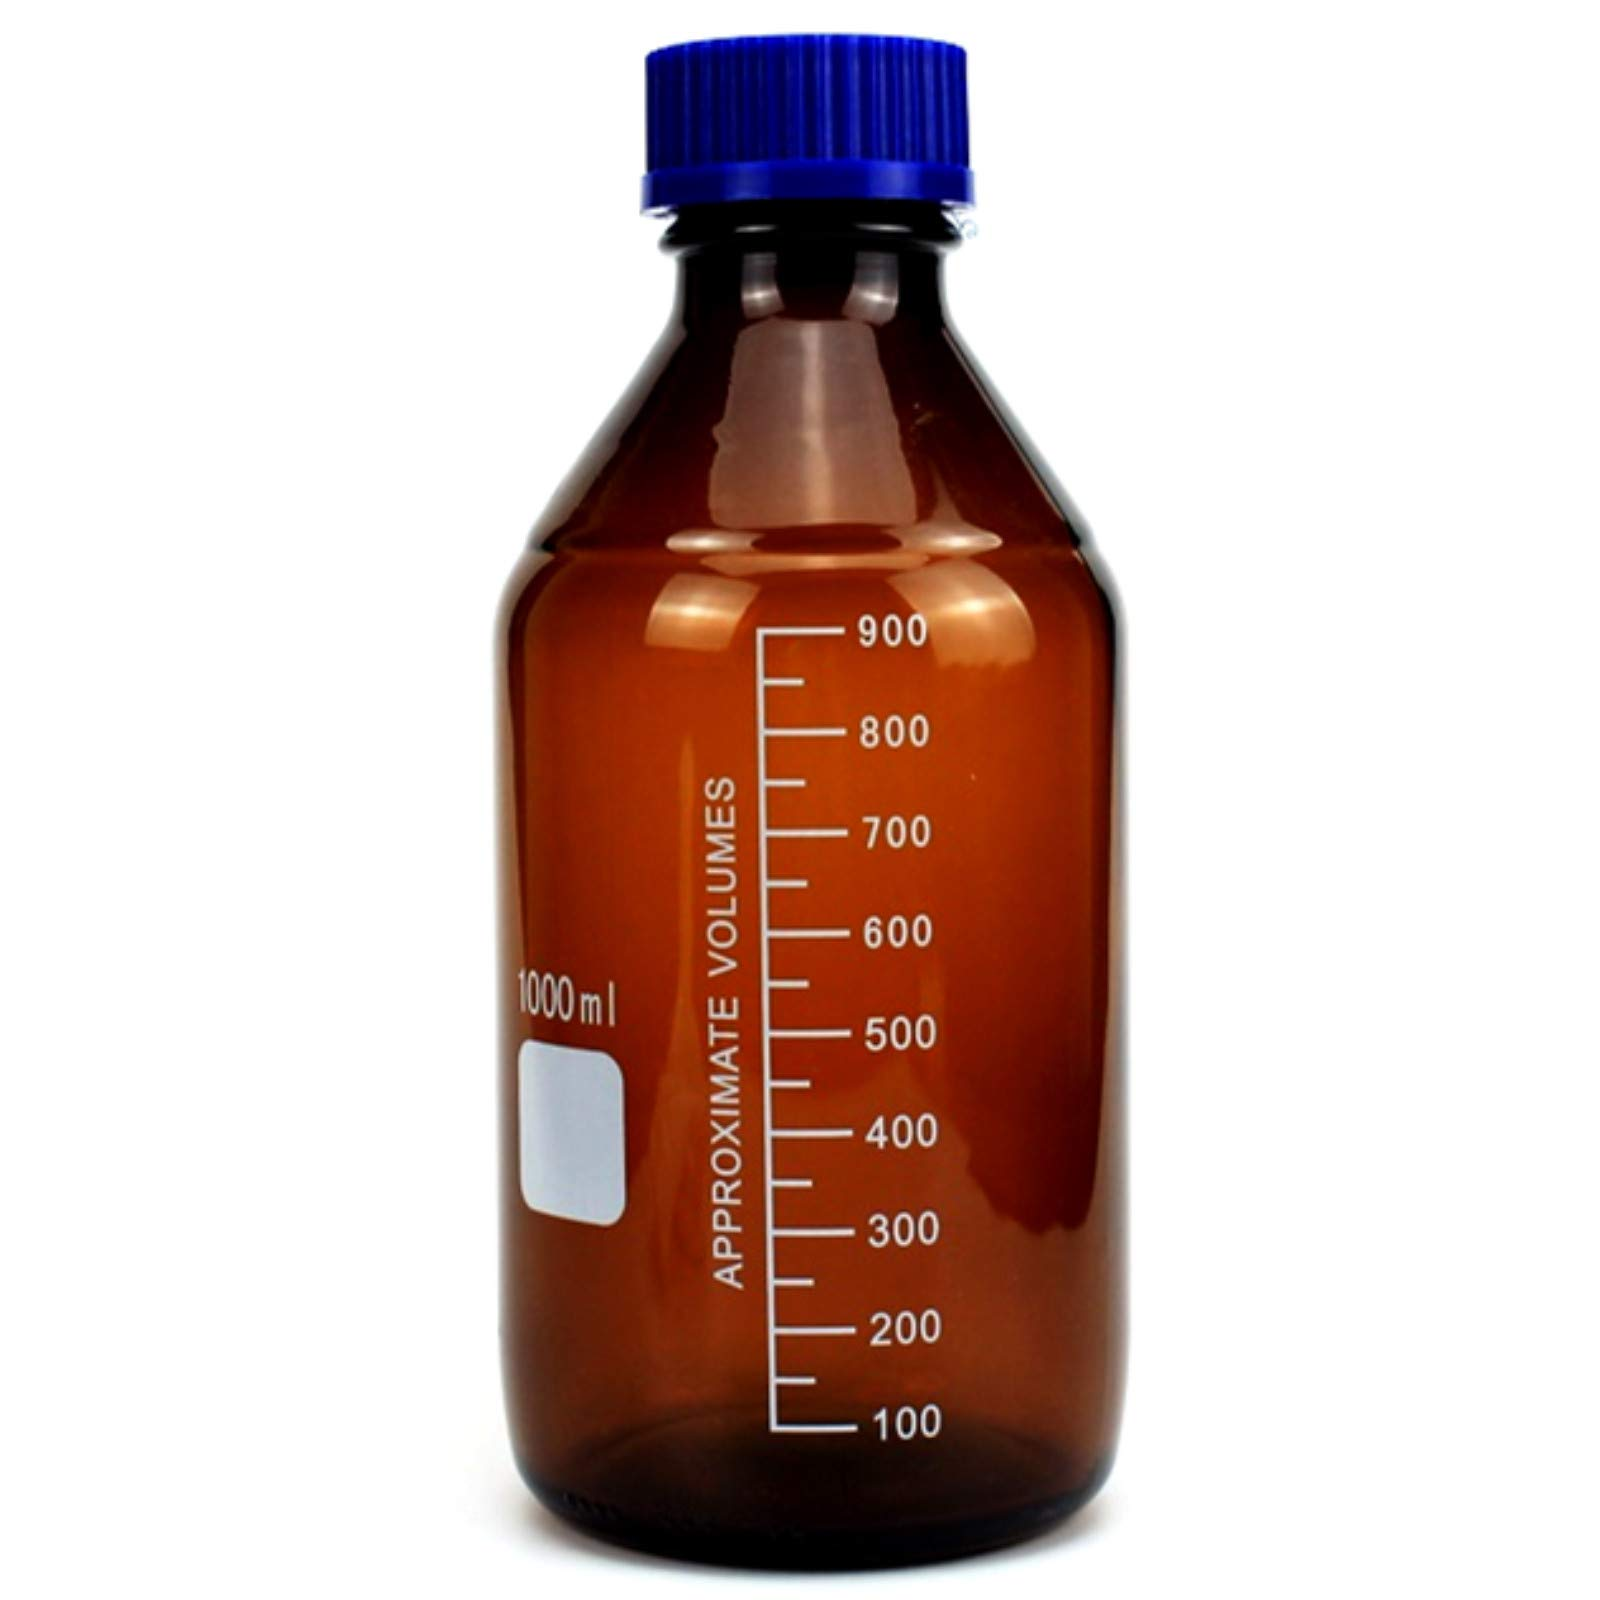 Deschem 1000ml,Lab Glass Amber Reagent Bottle,Screw Cap Lid,1Litre Brown Flask by Deschem